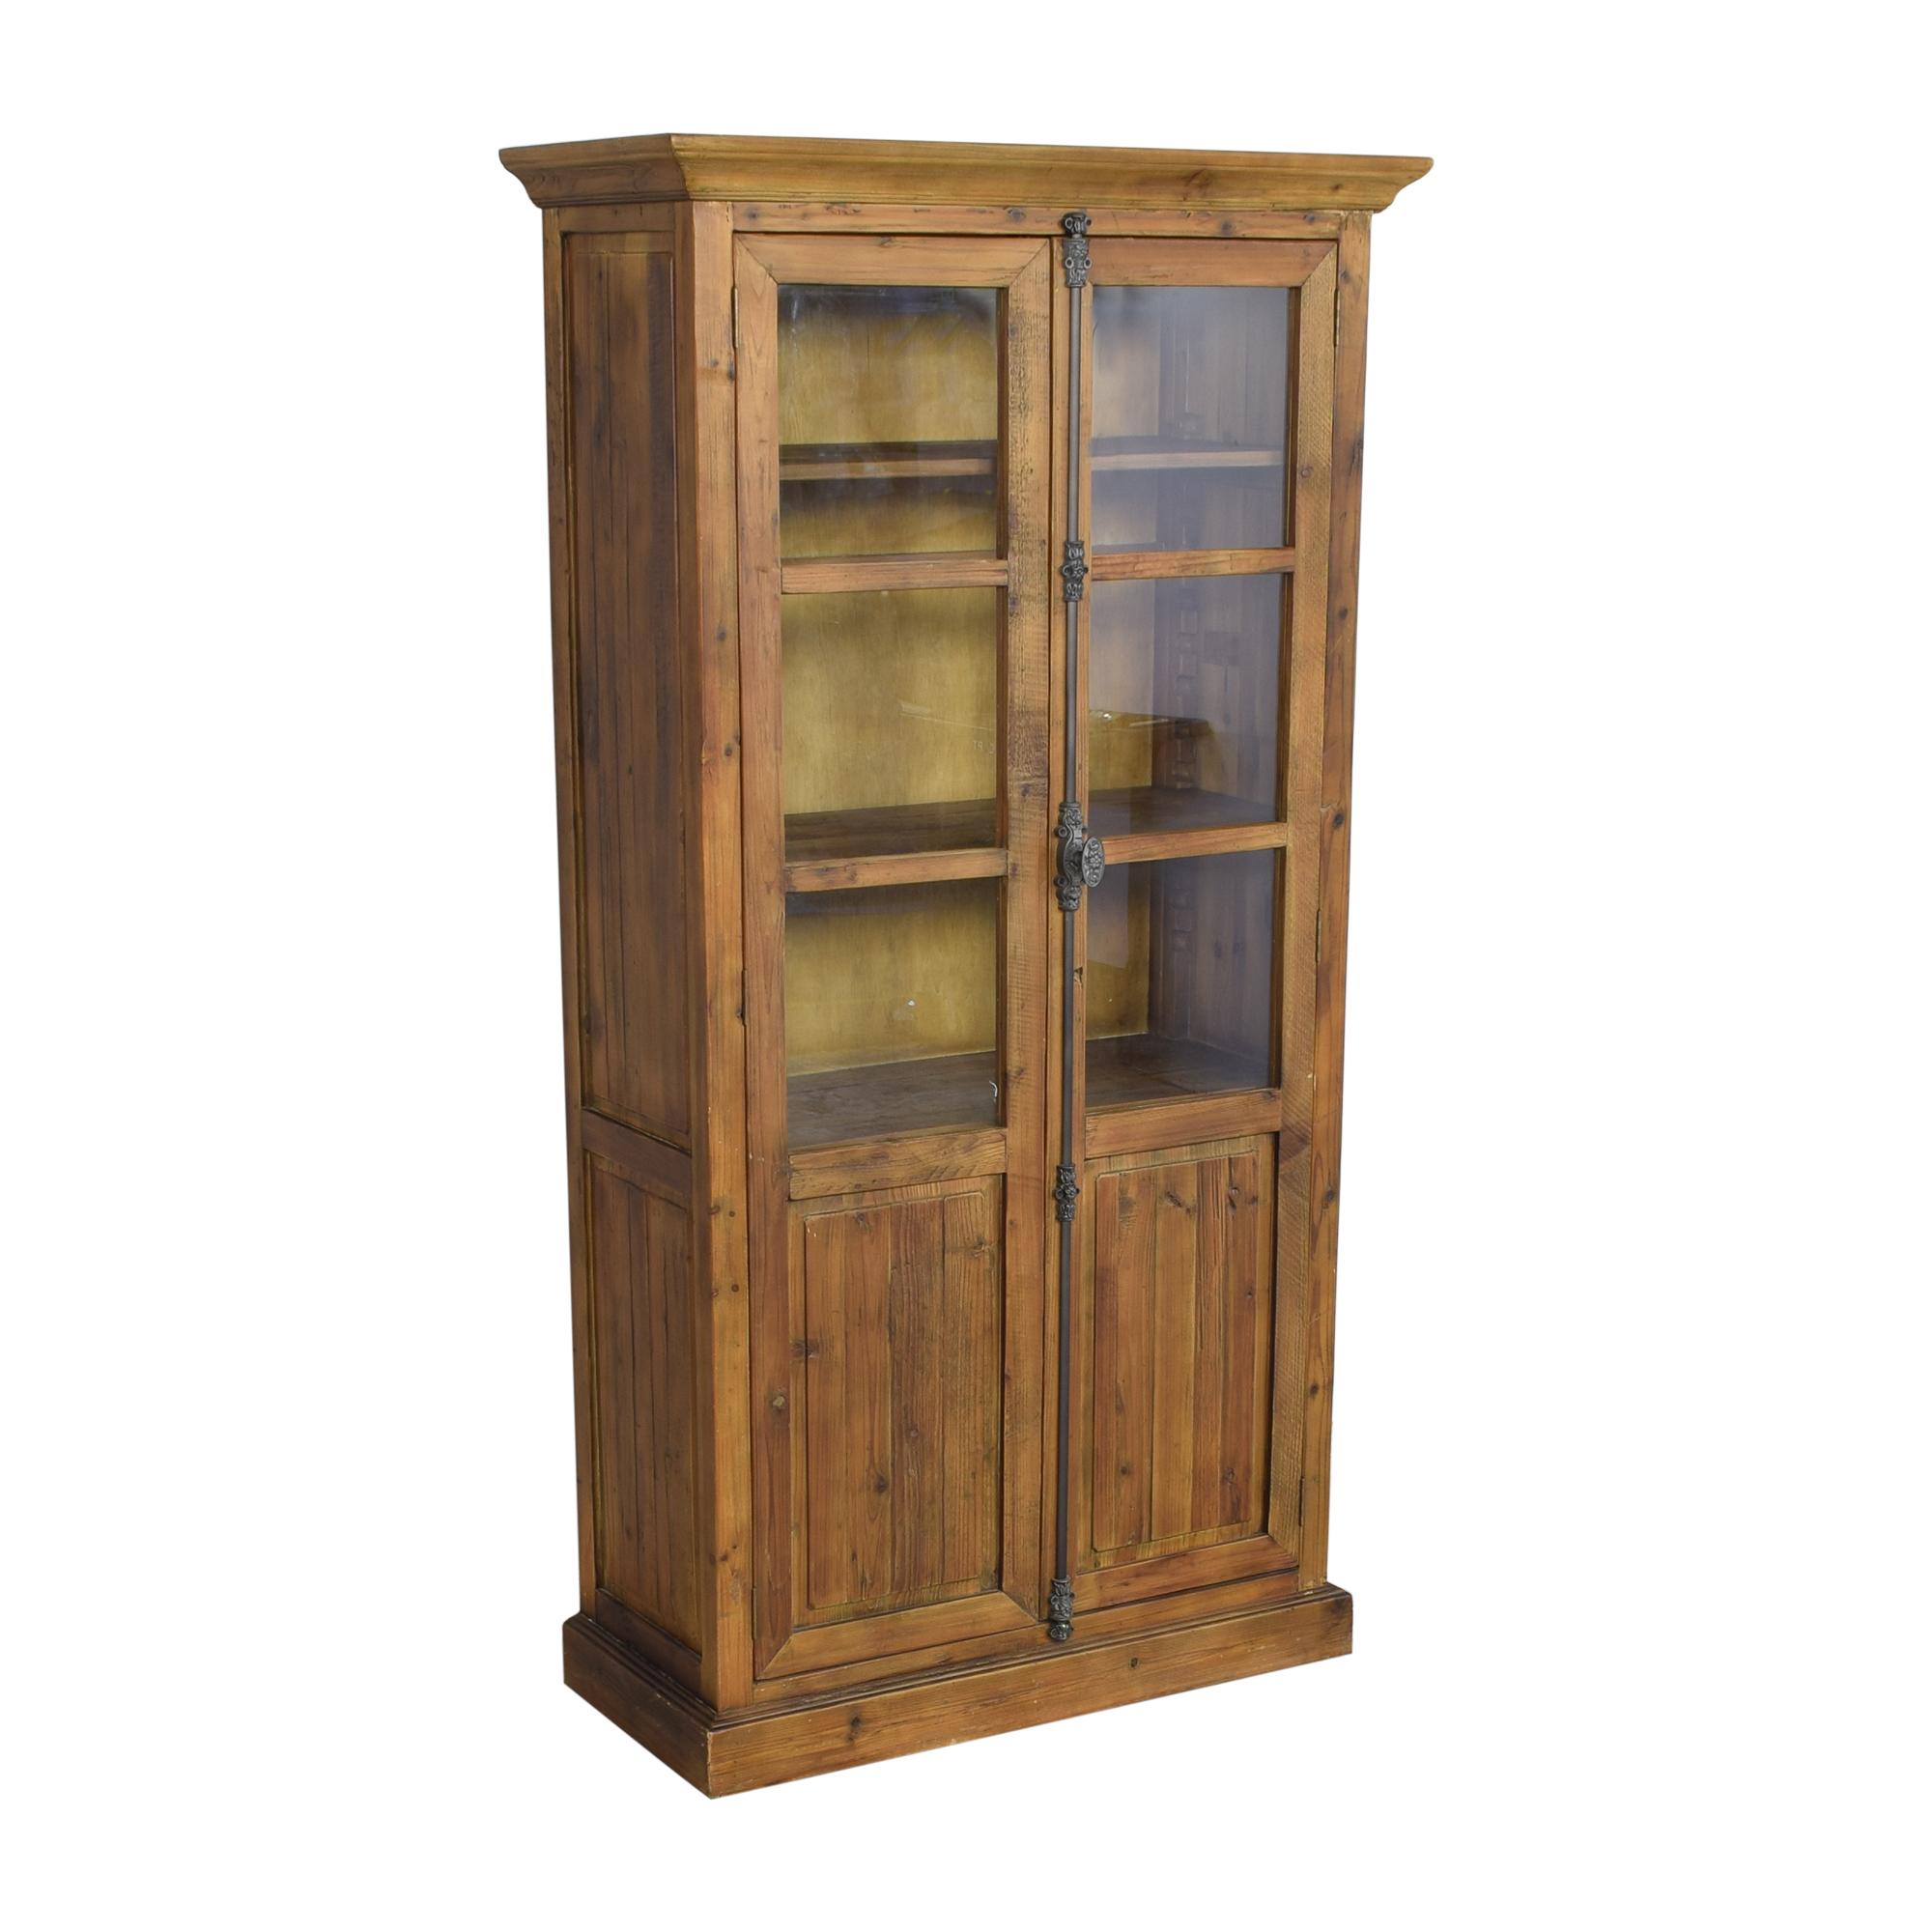 buy Crate & Barrel Bedford Tall Cabinet Crate & Barrel Storage